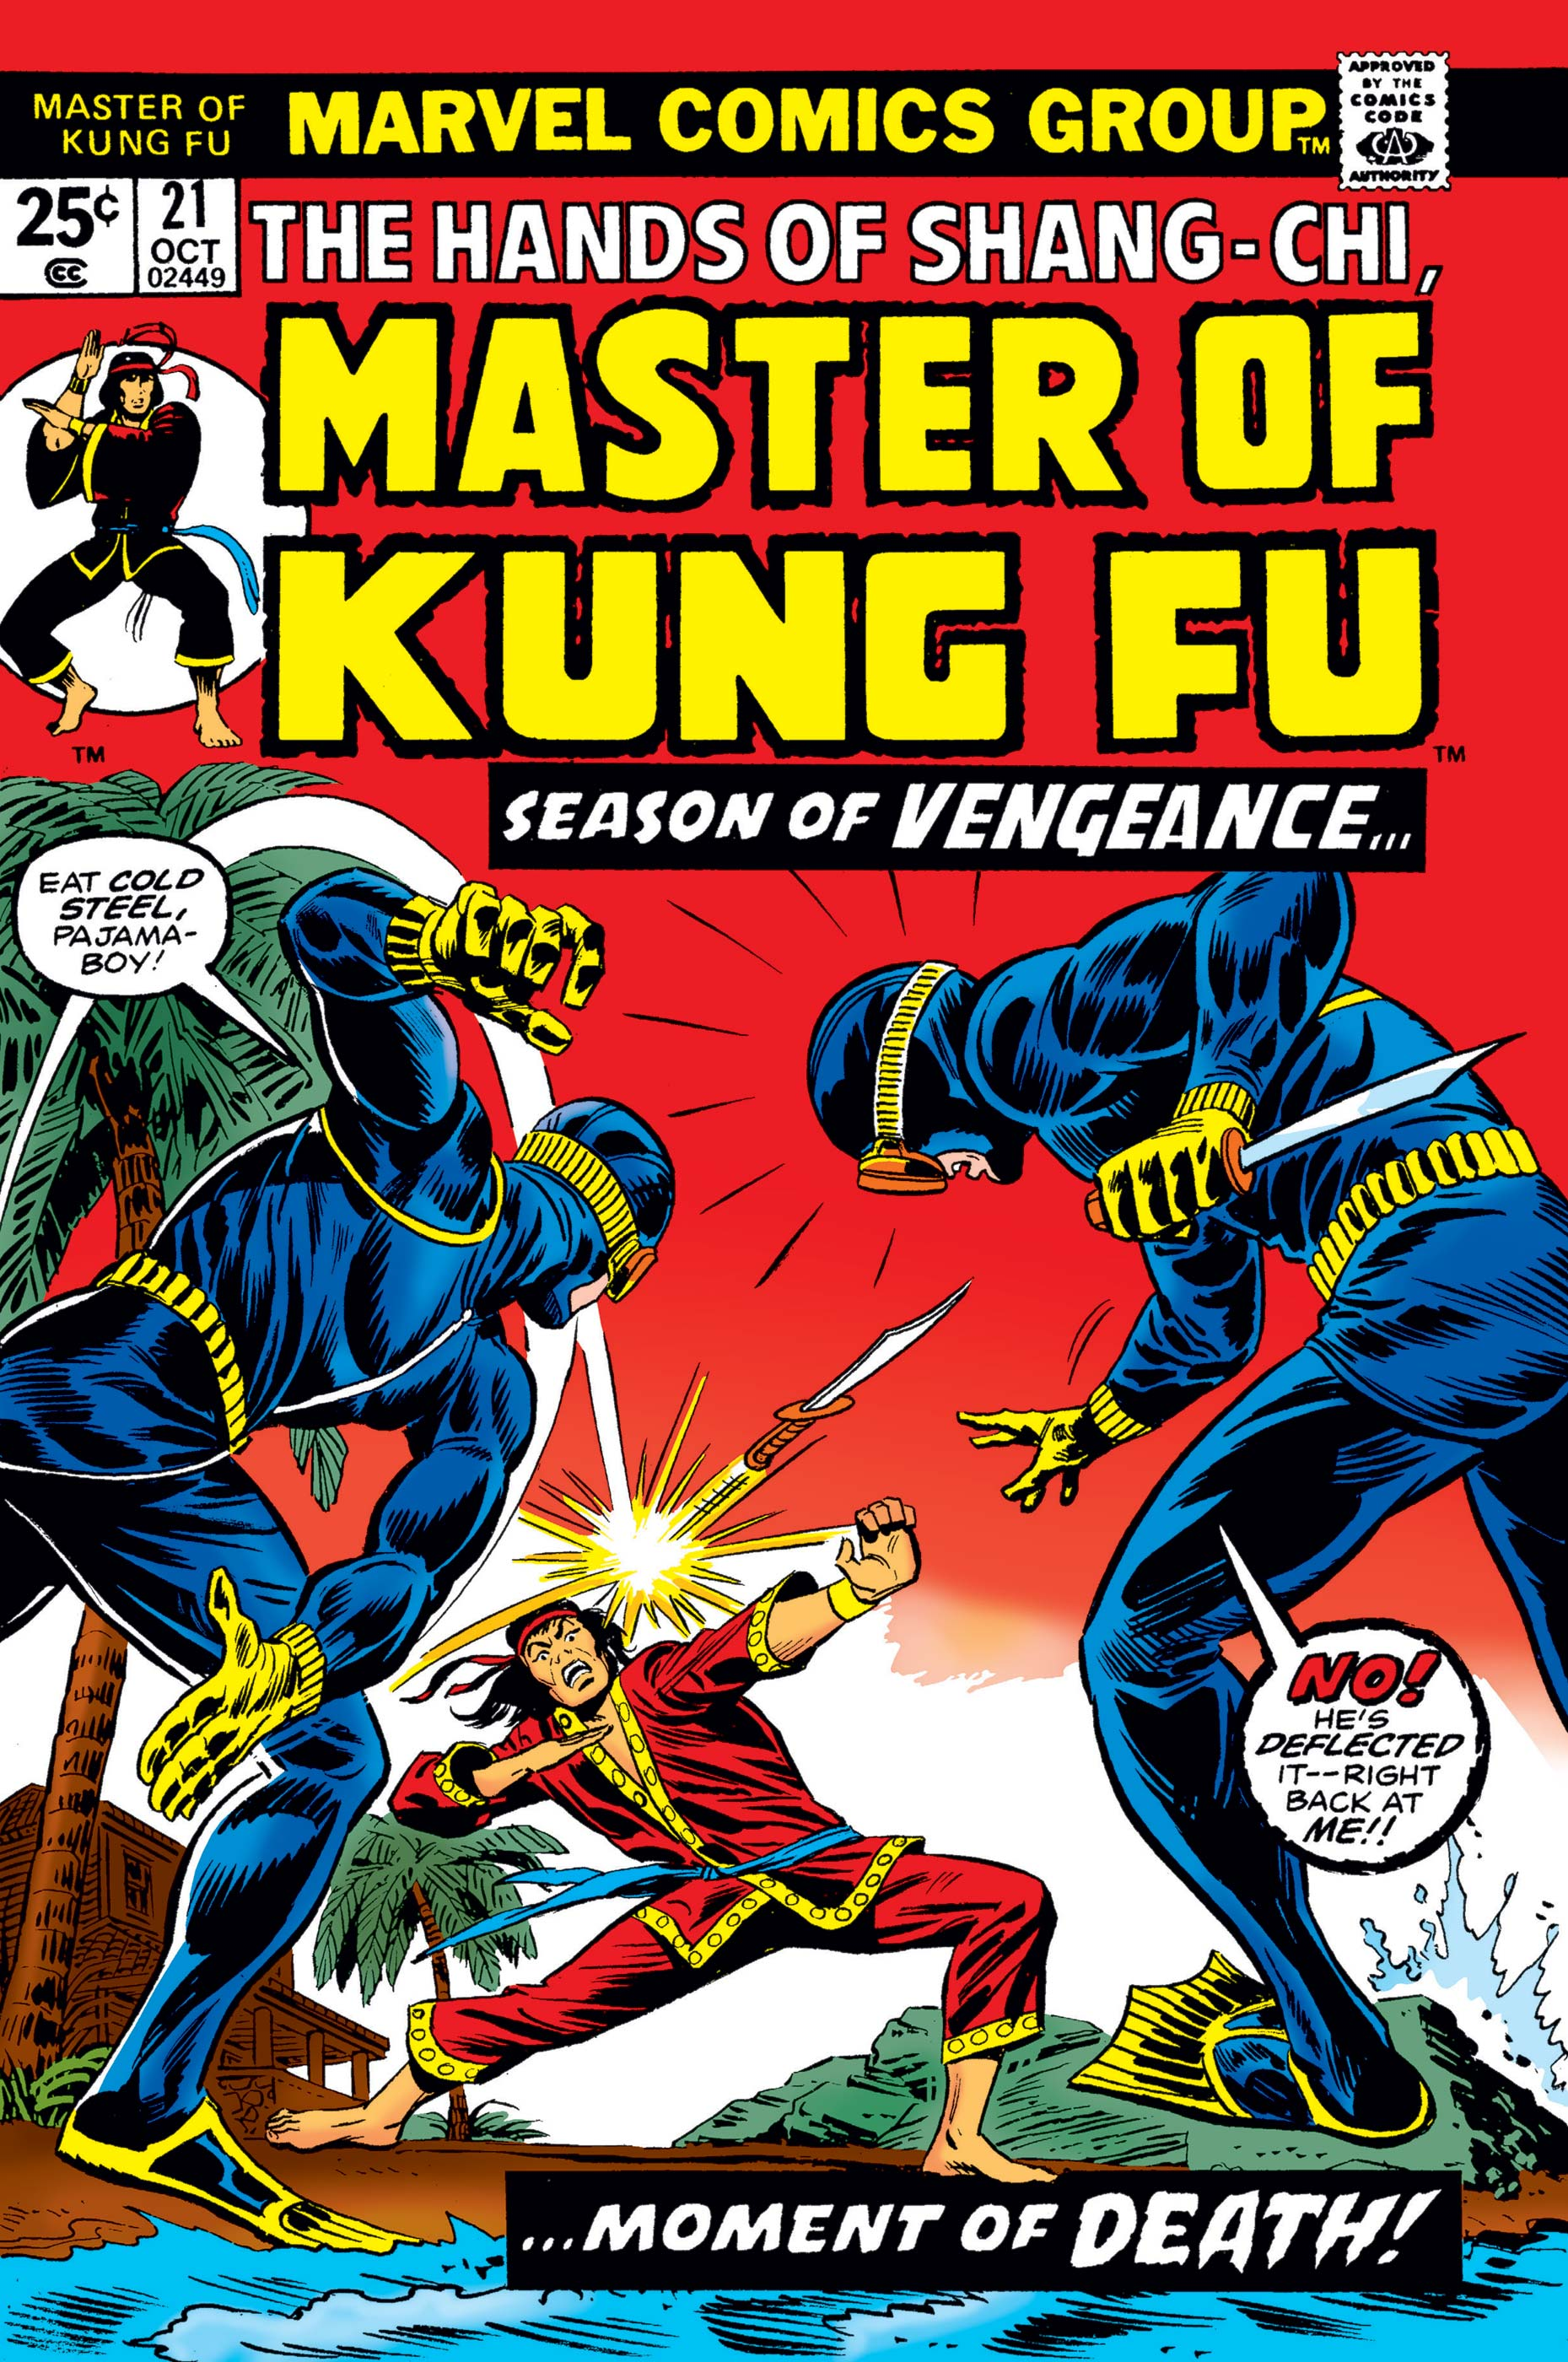 Master of Kung Fu (1974) #21